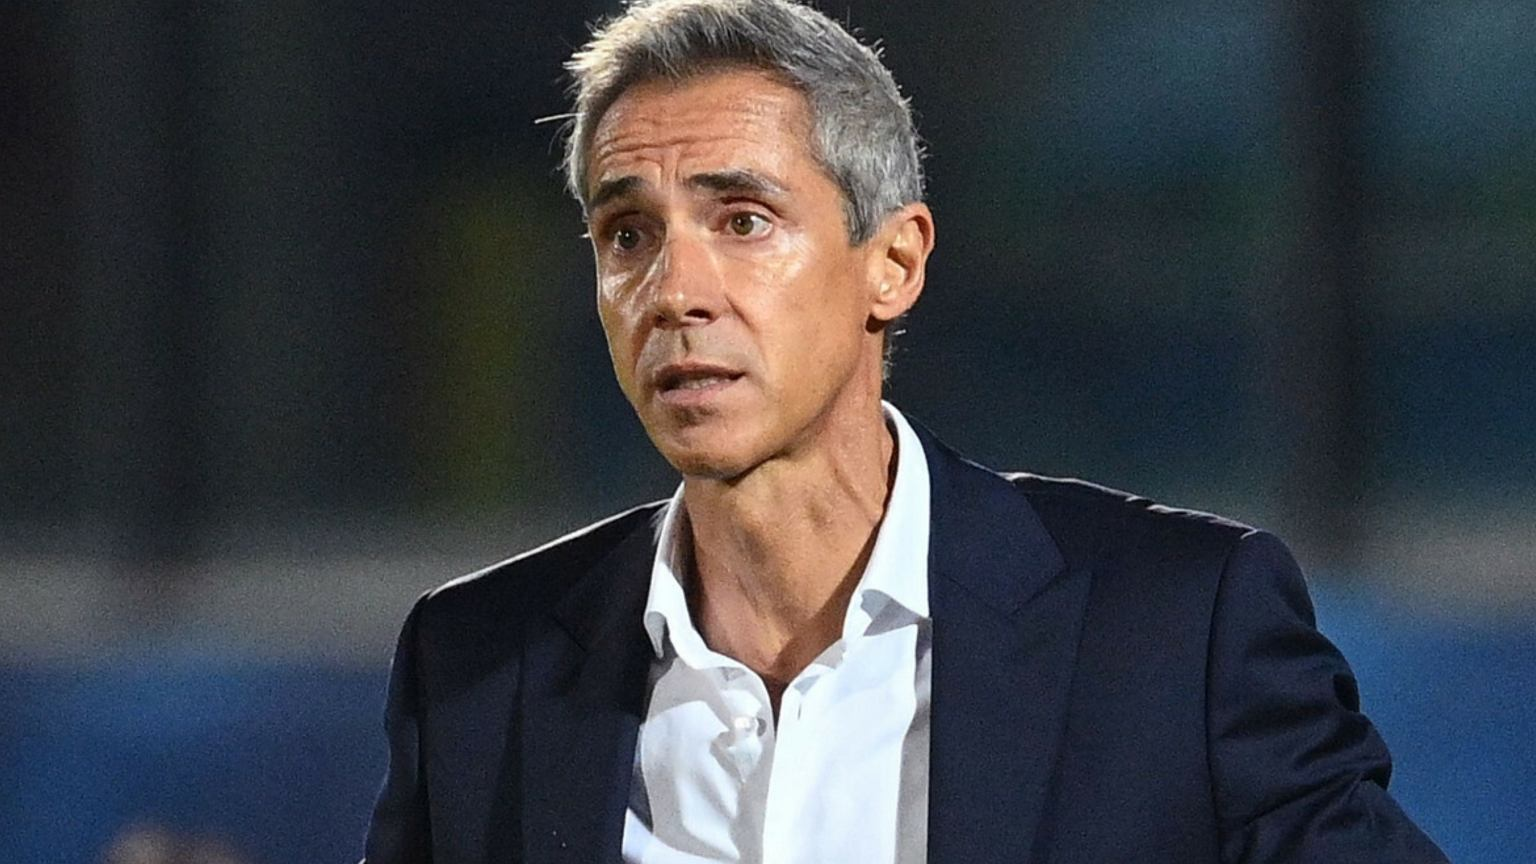 Dariush Dodik, coach of Zagobi Sosnovic